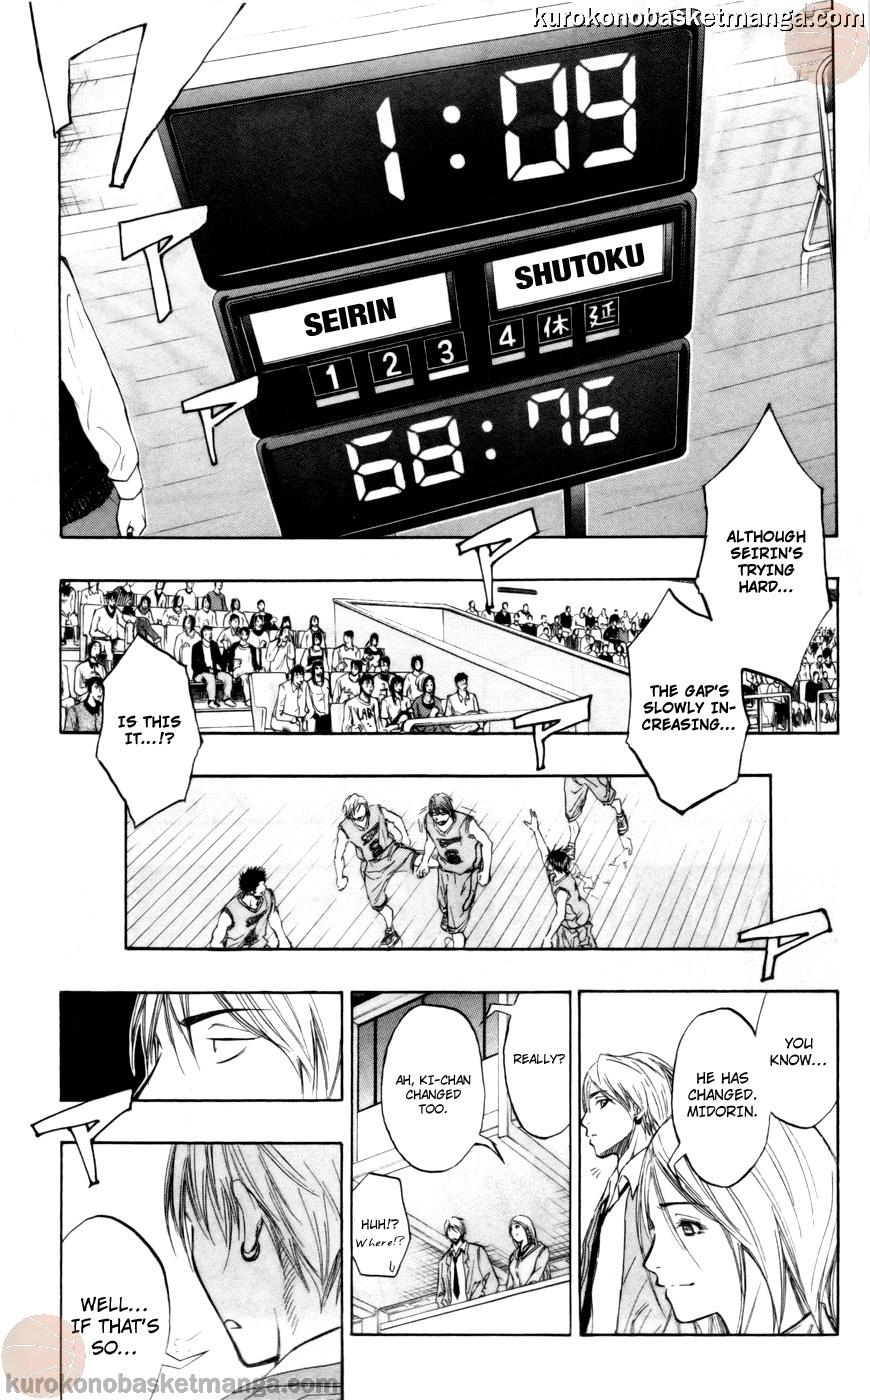 Kuroko no Basket Manga Chapter 89 - Image 14